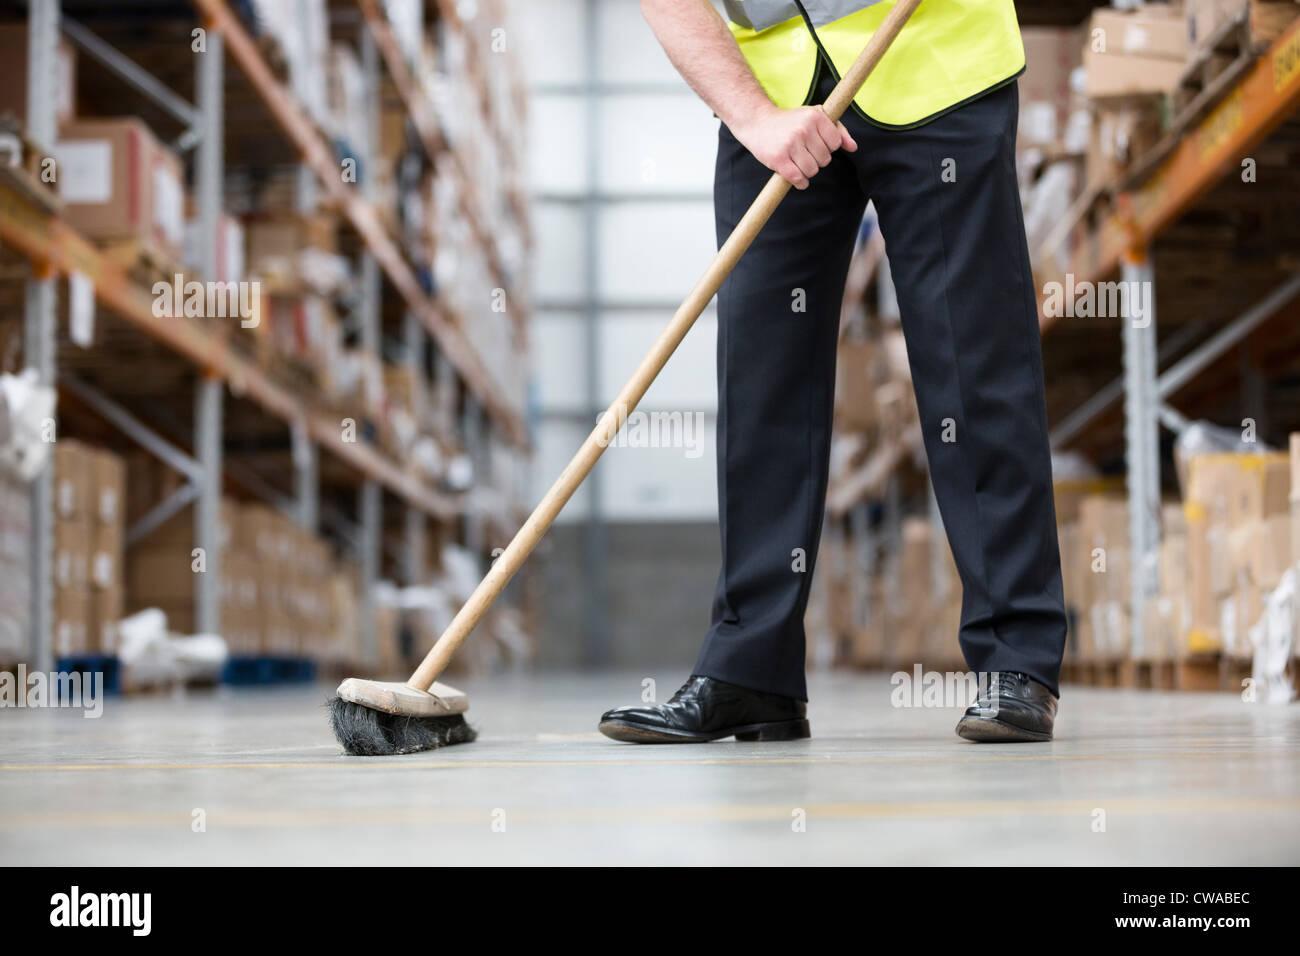 Man sweeping warehouse floor with broom - Stock Image